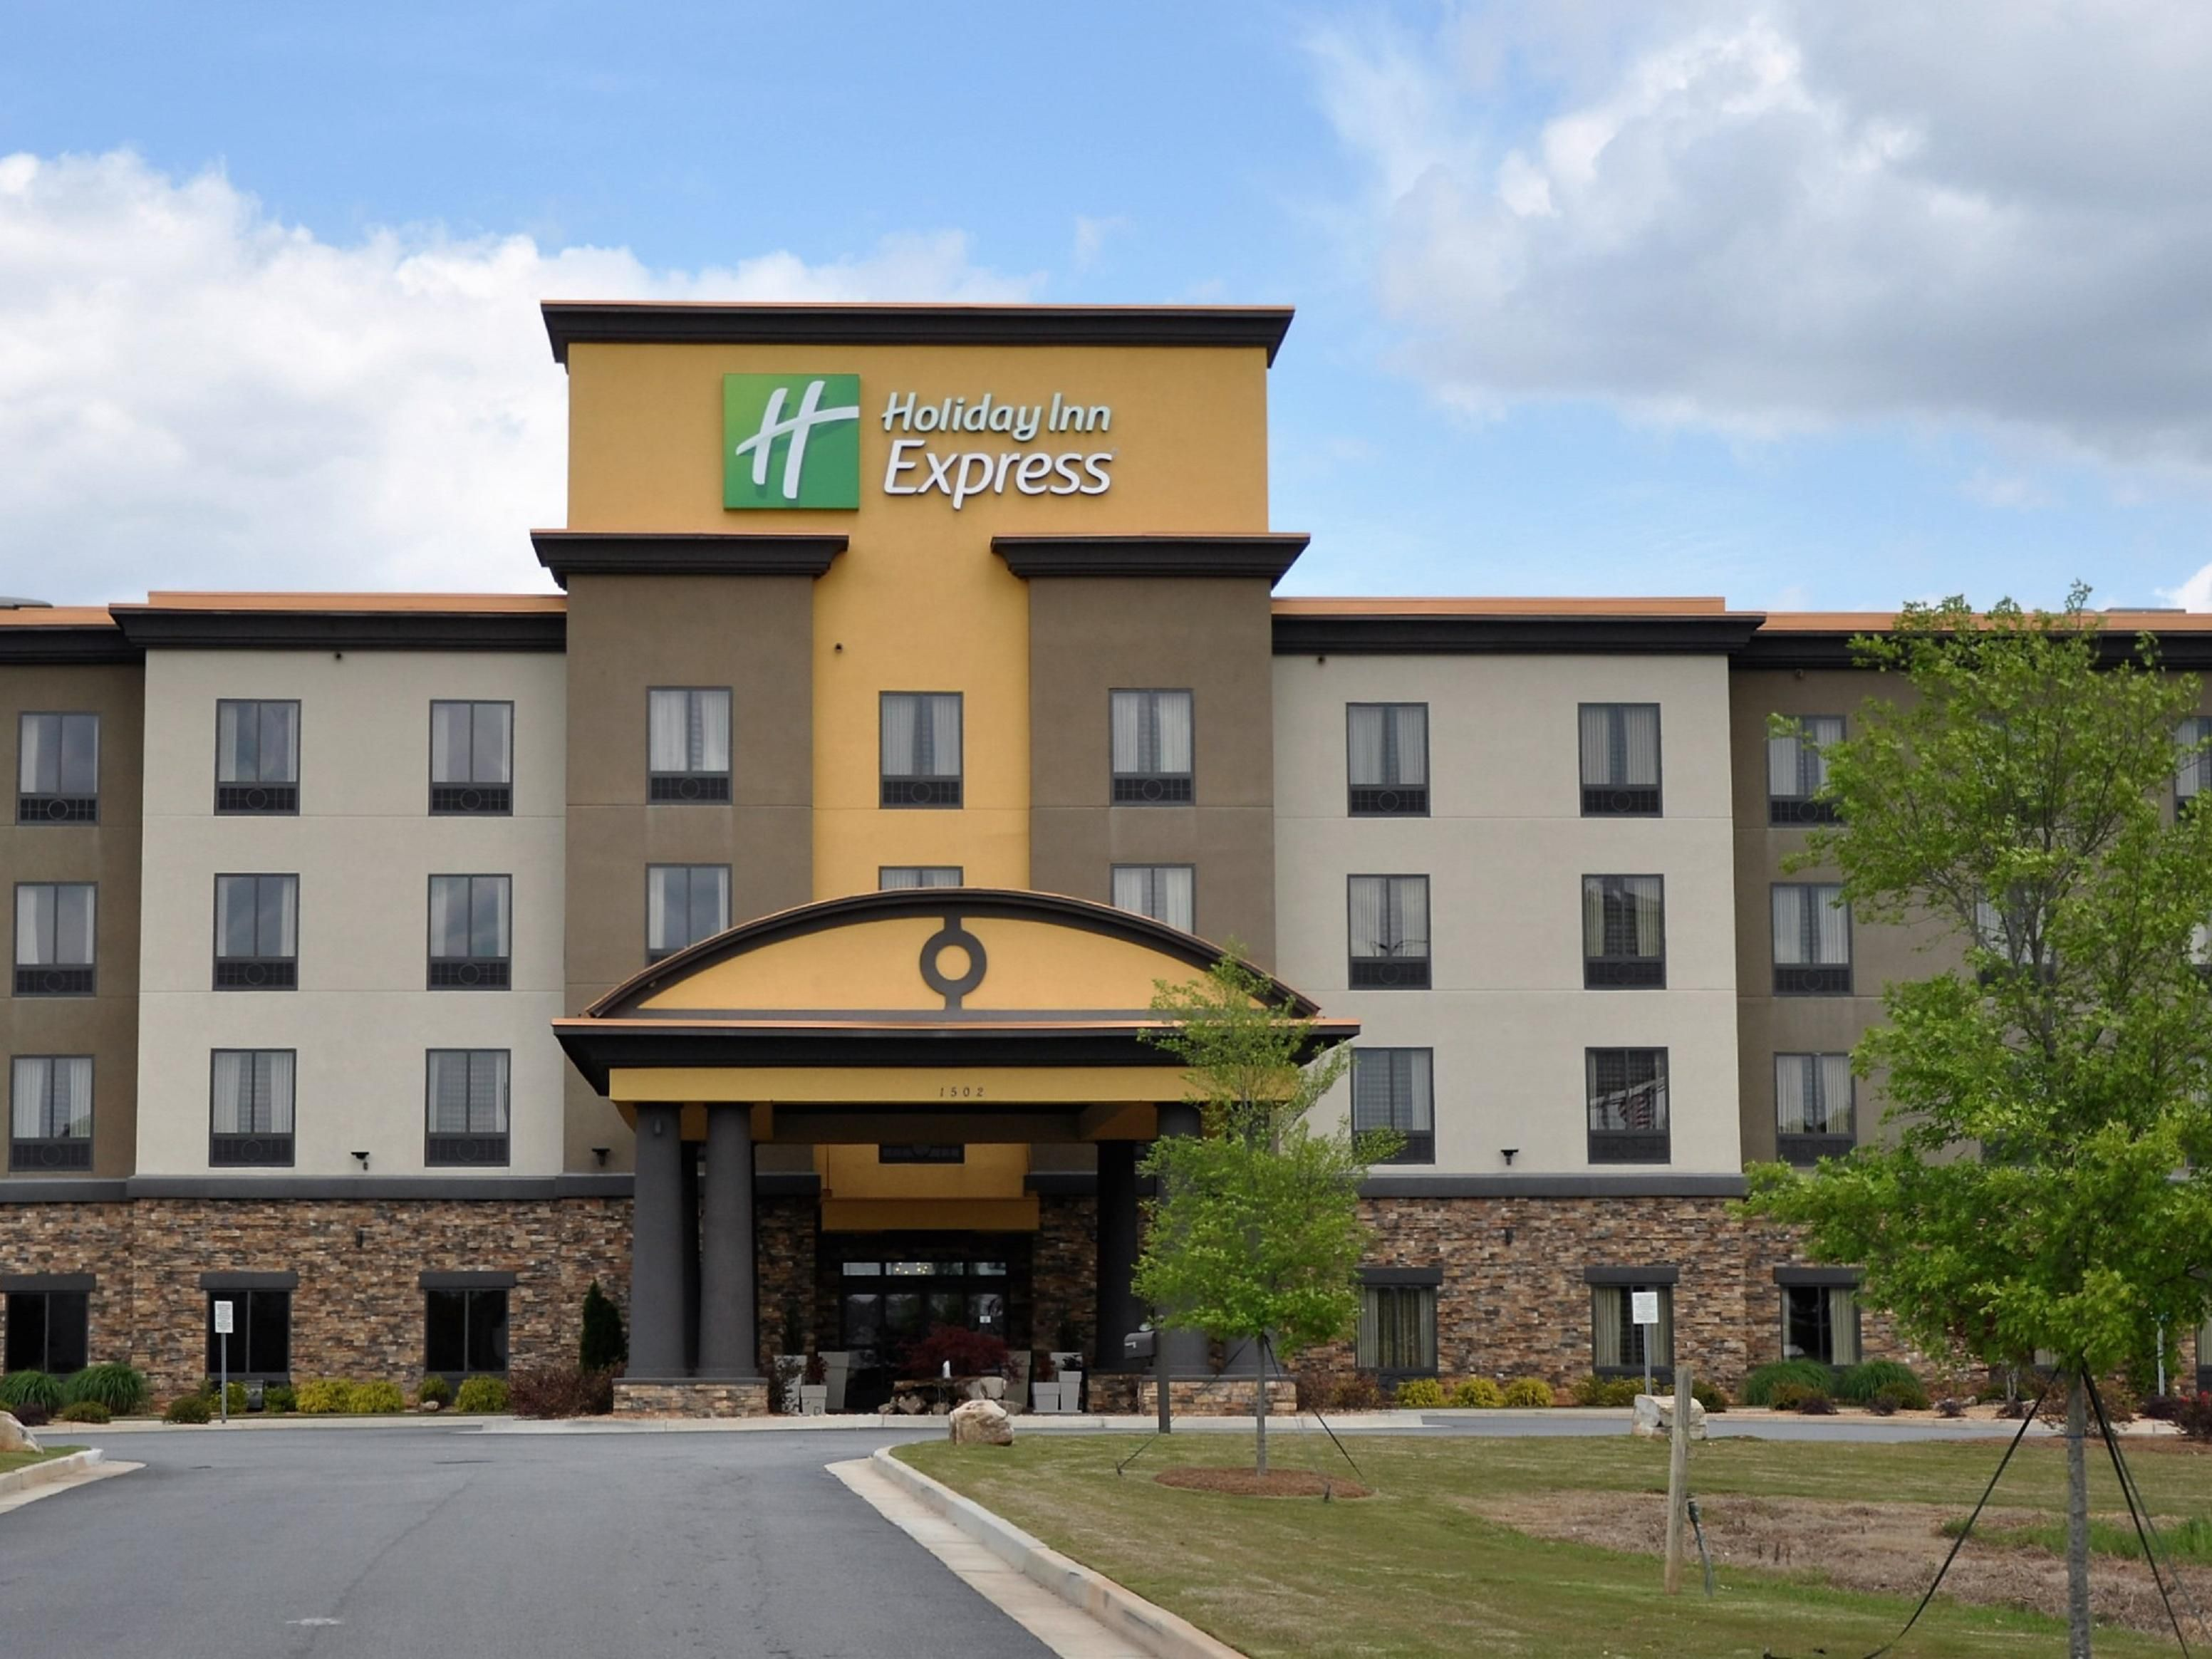 Hotels And Motels In Warner Robins Ga